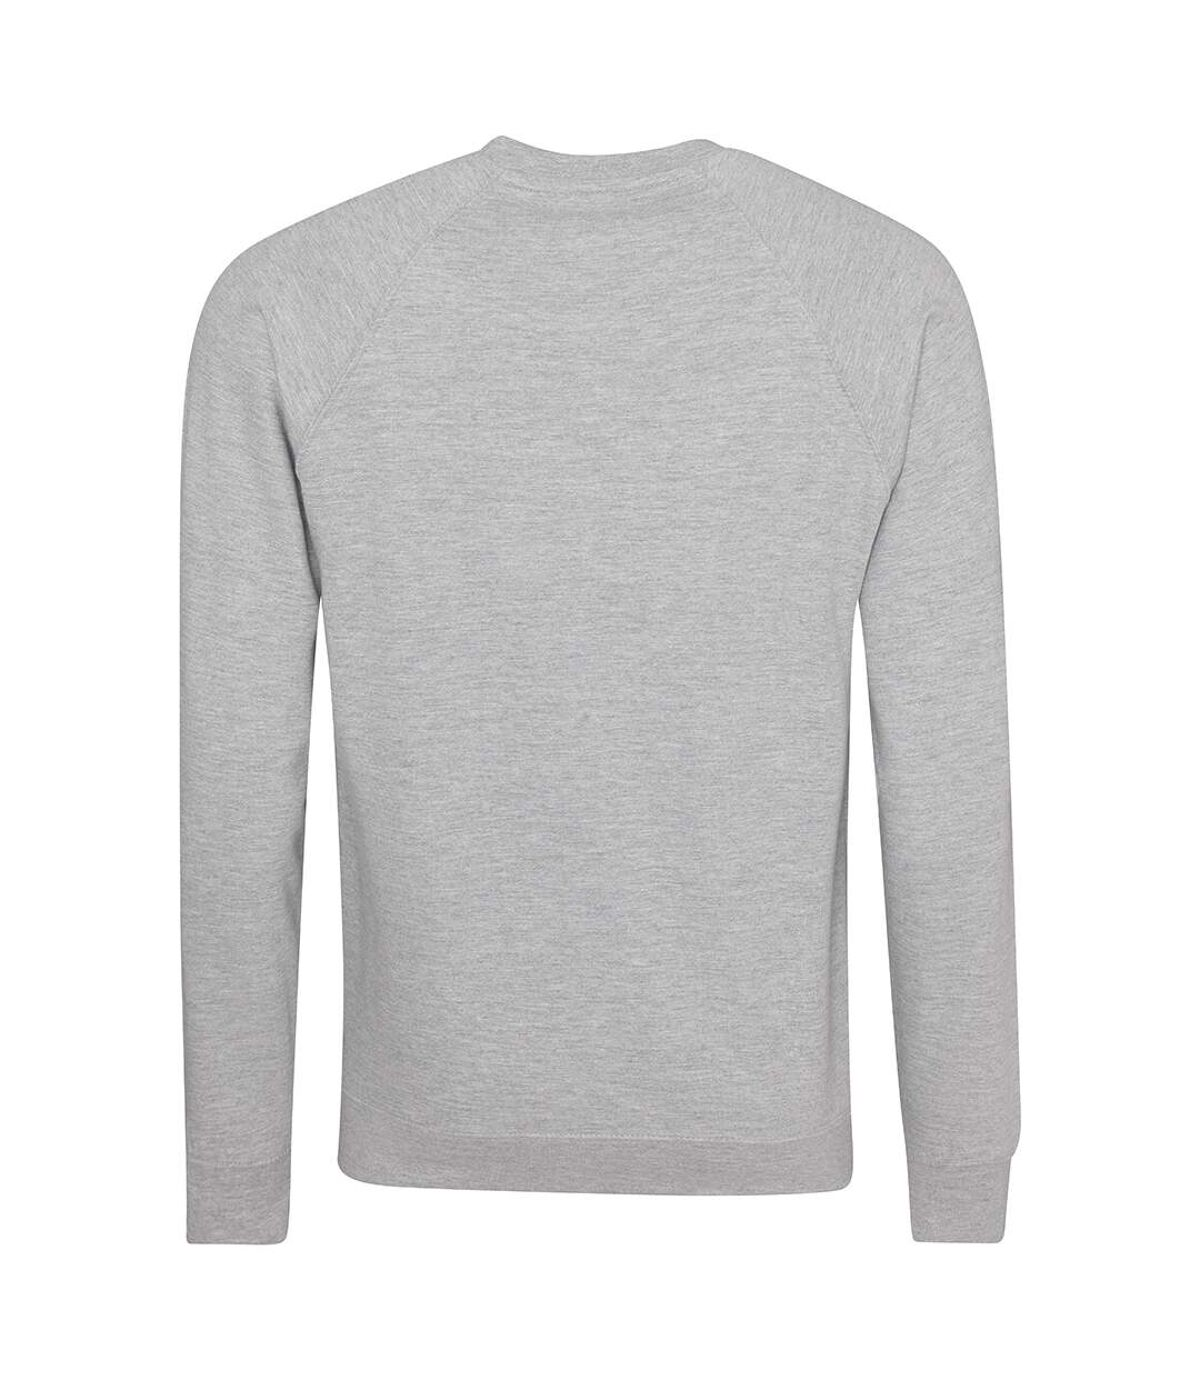 AWDis Academy Mens Crew Neck Raglan Sweatshirt (Grey) - UTRW3916